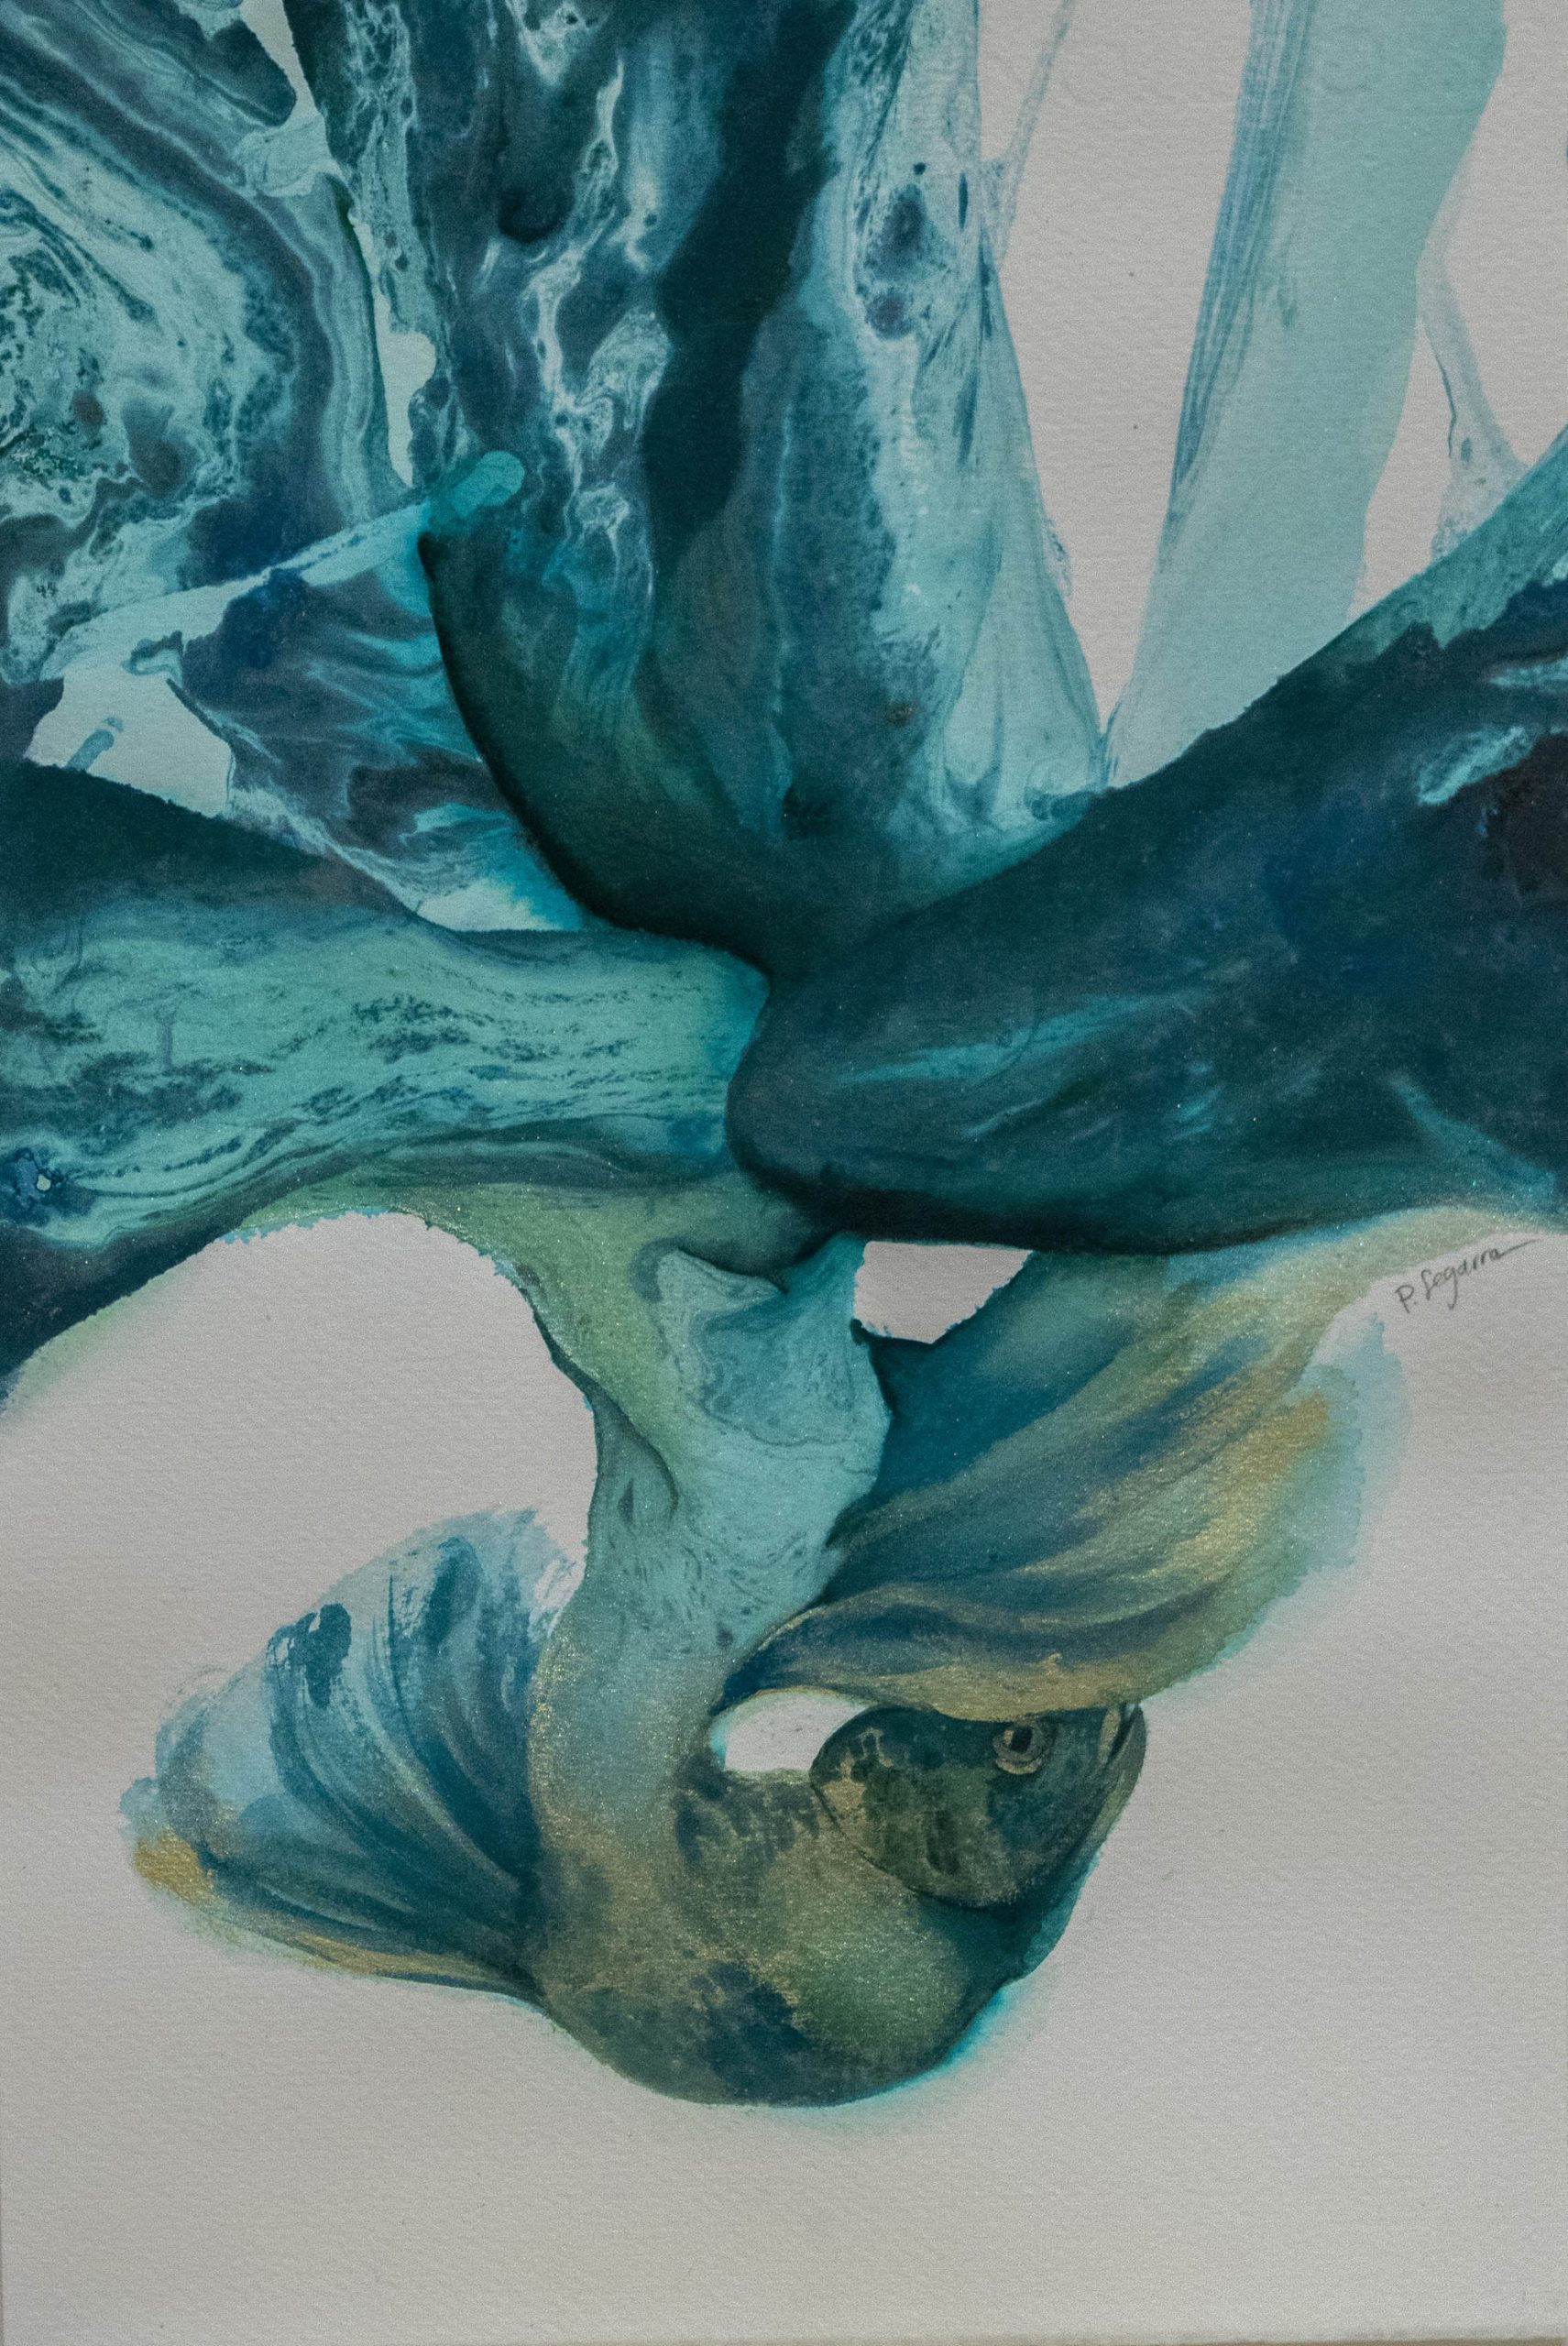 Abisales by Paula Segarra